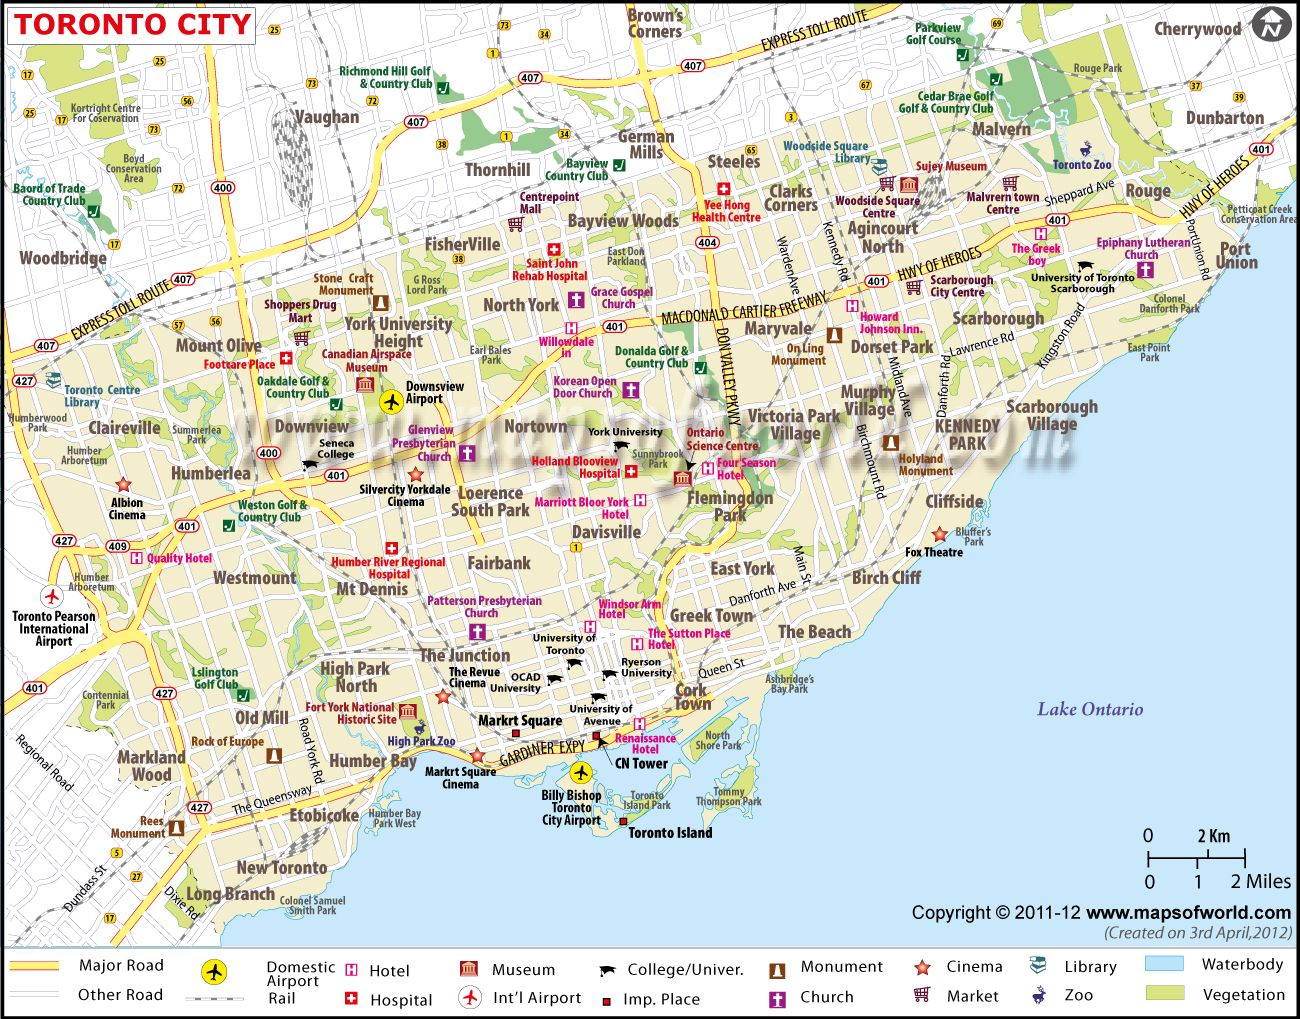 Toronto Map Canada Toronto City #Map | Toronto map, Toronto city, Toronto canada map